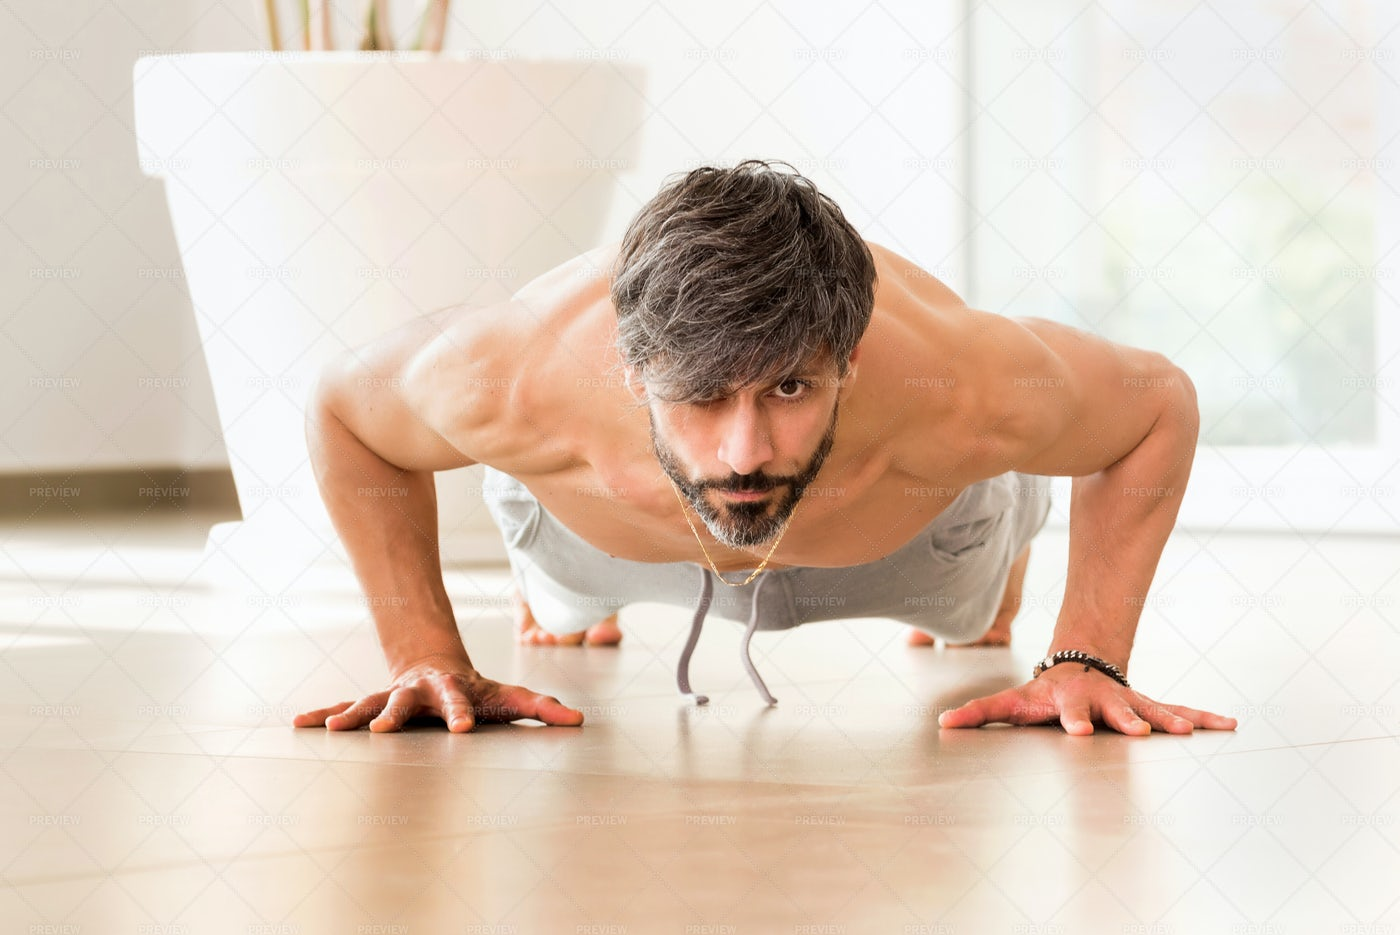 Man Exercising On Plank: Stock Photos